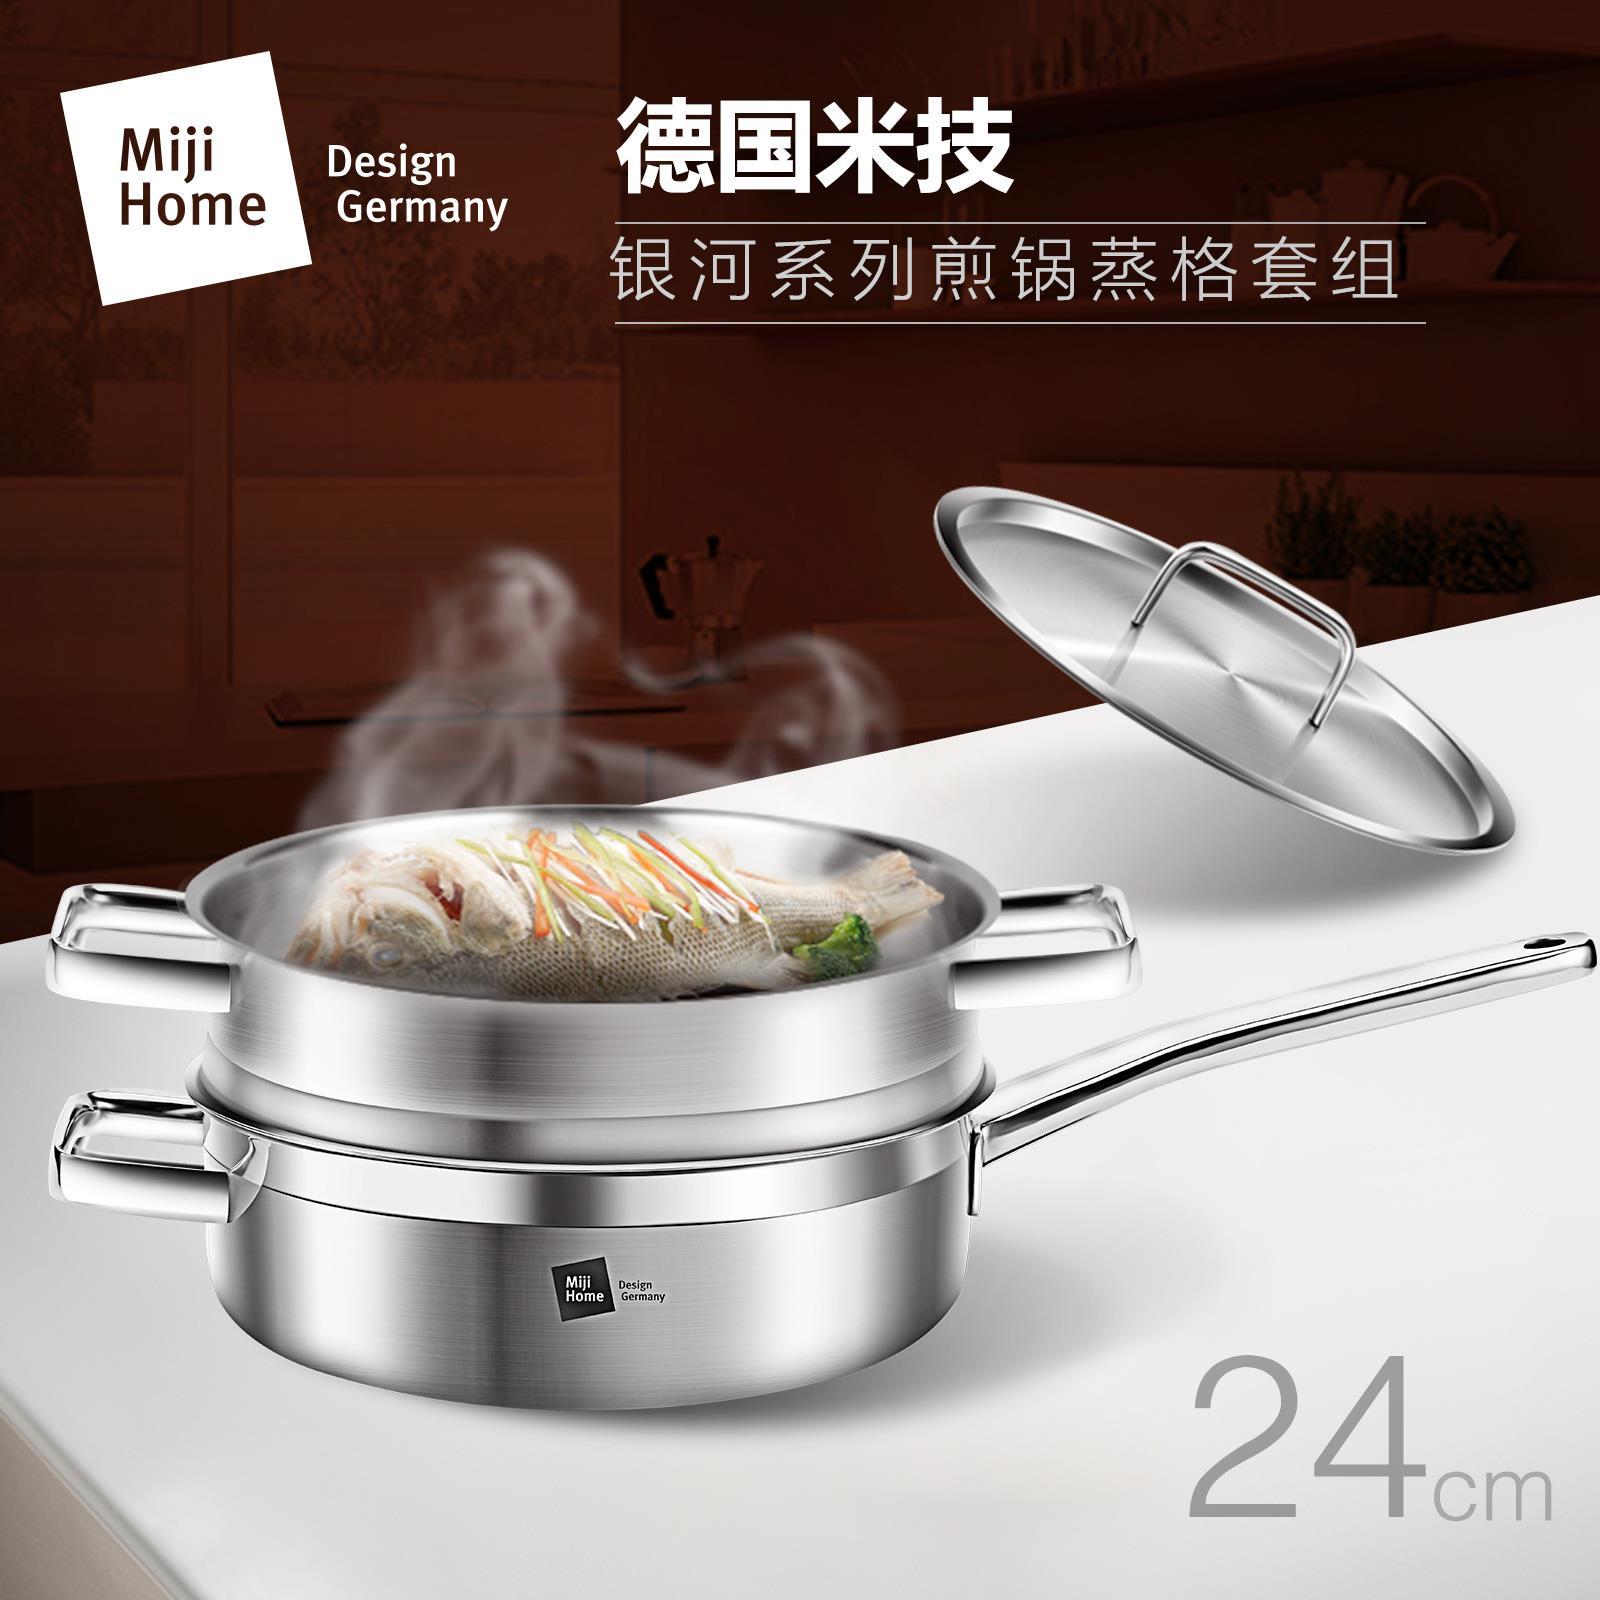 Miji 米技 银河系列-24CM西式煎锅带蒸格套装H-SS24-BC-TZ